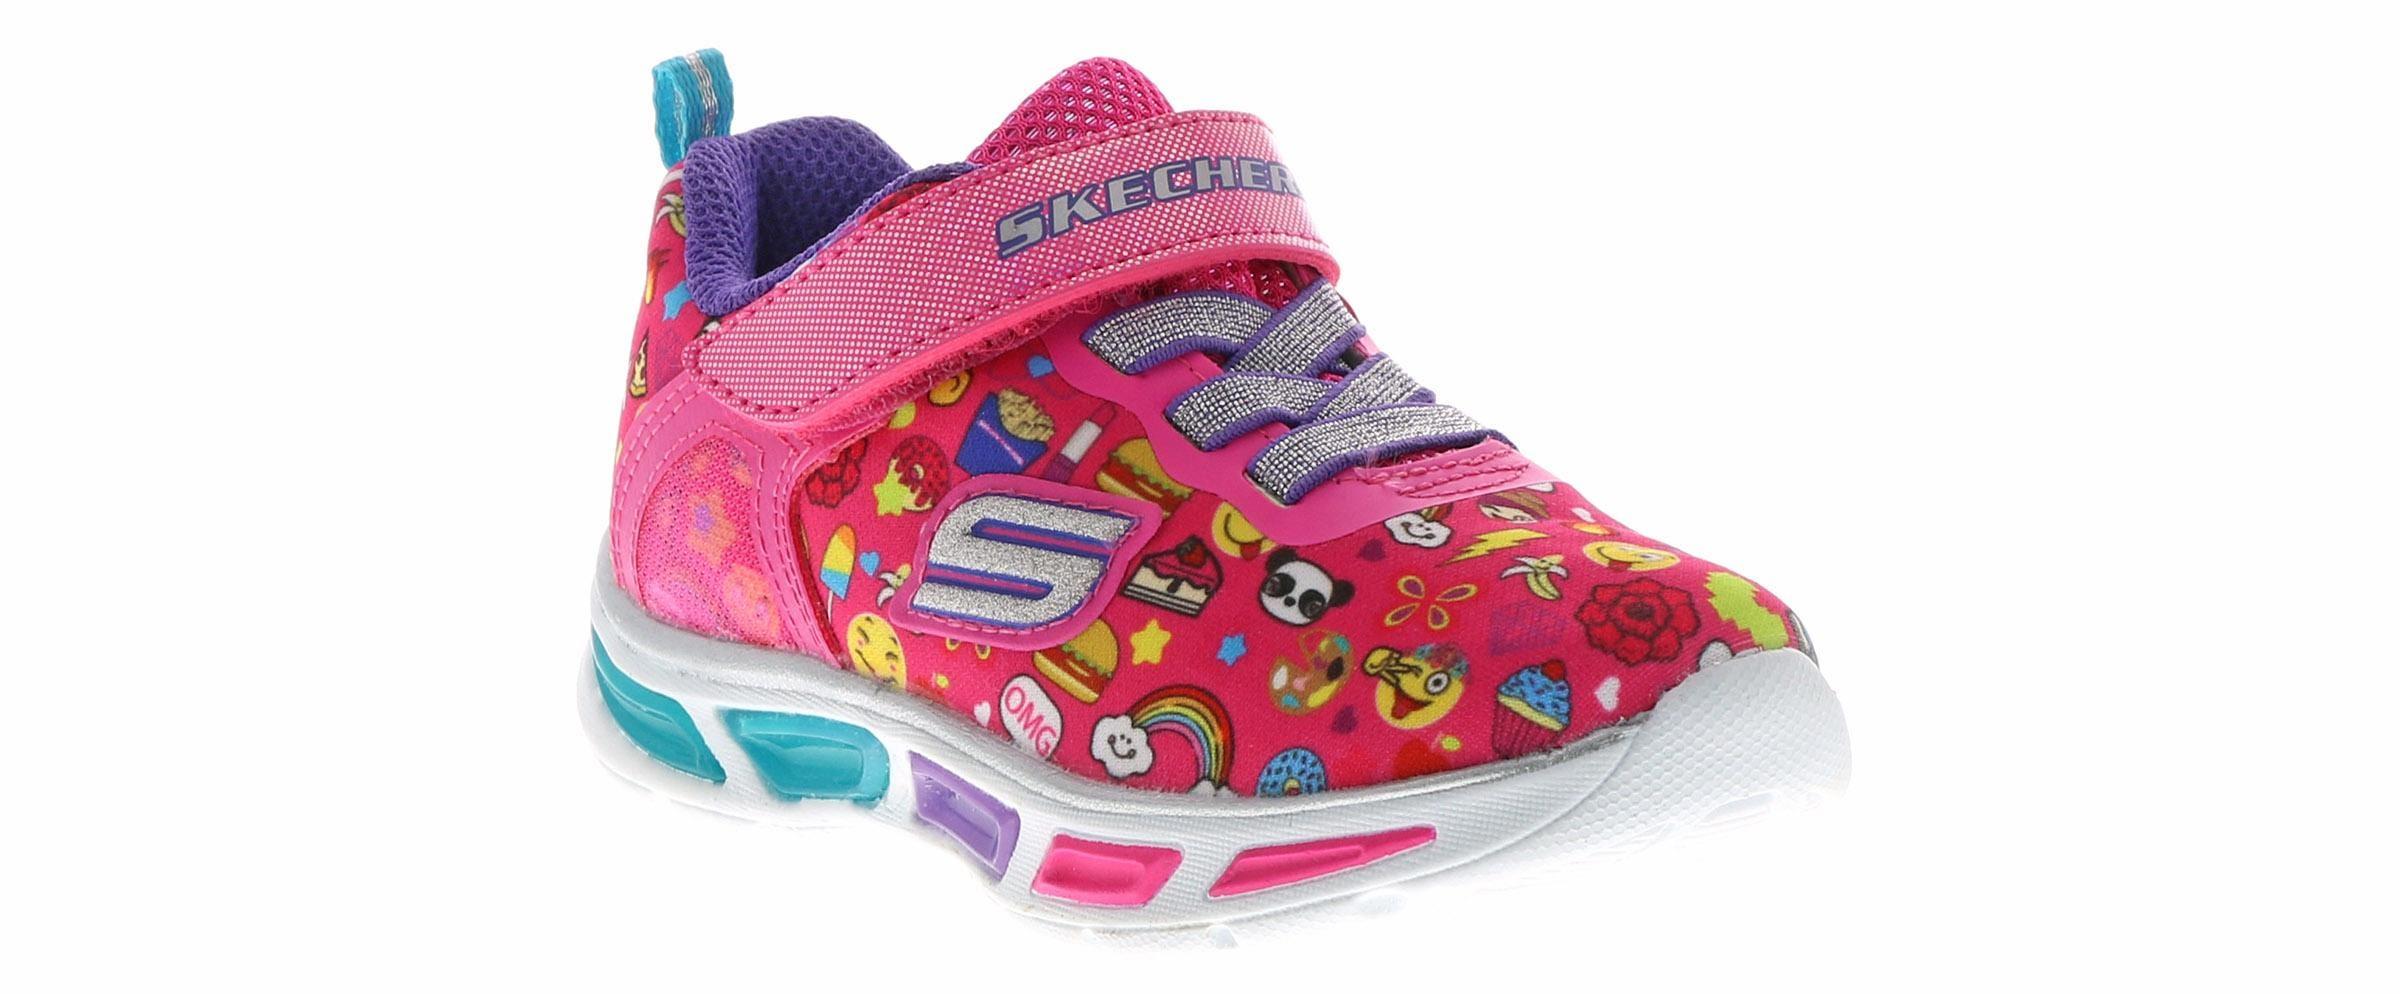 Kid's Skechers Lightbeams Emoji (5 10) Pink Skosensation  Shoe Sensation